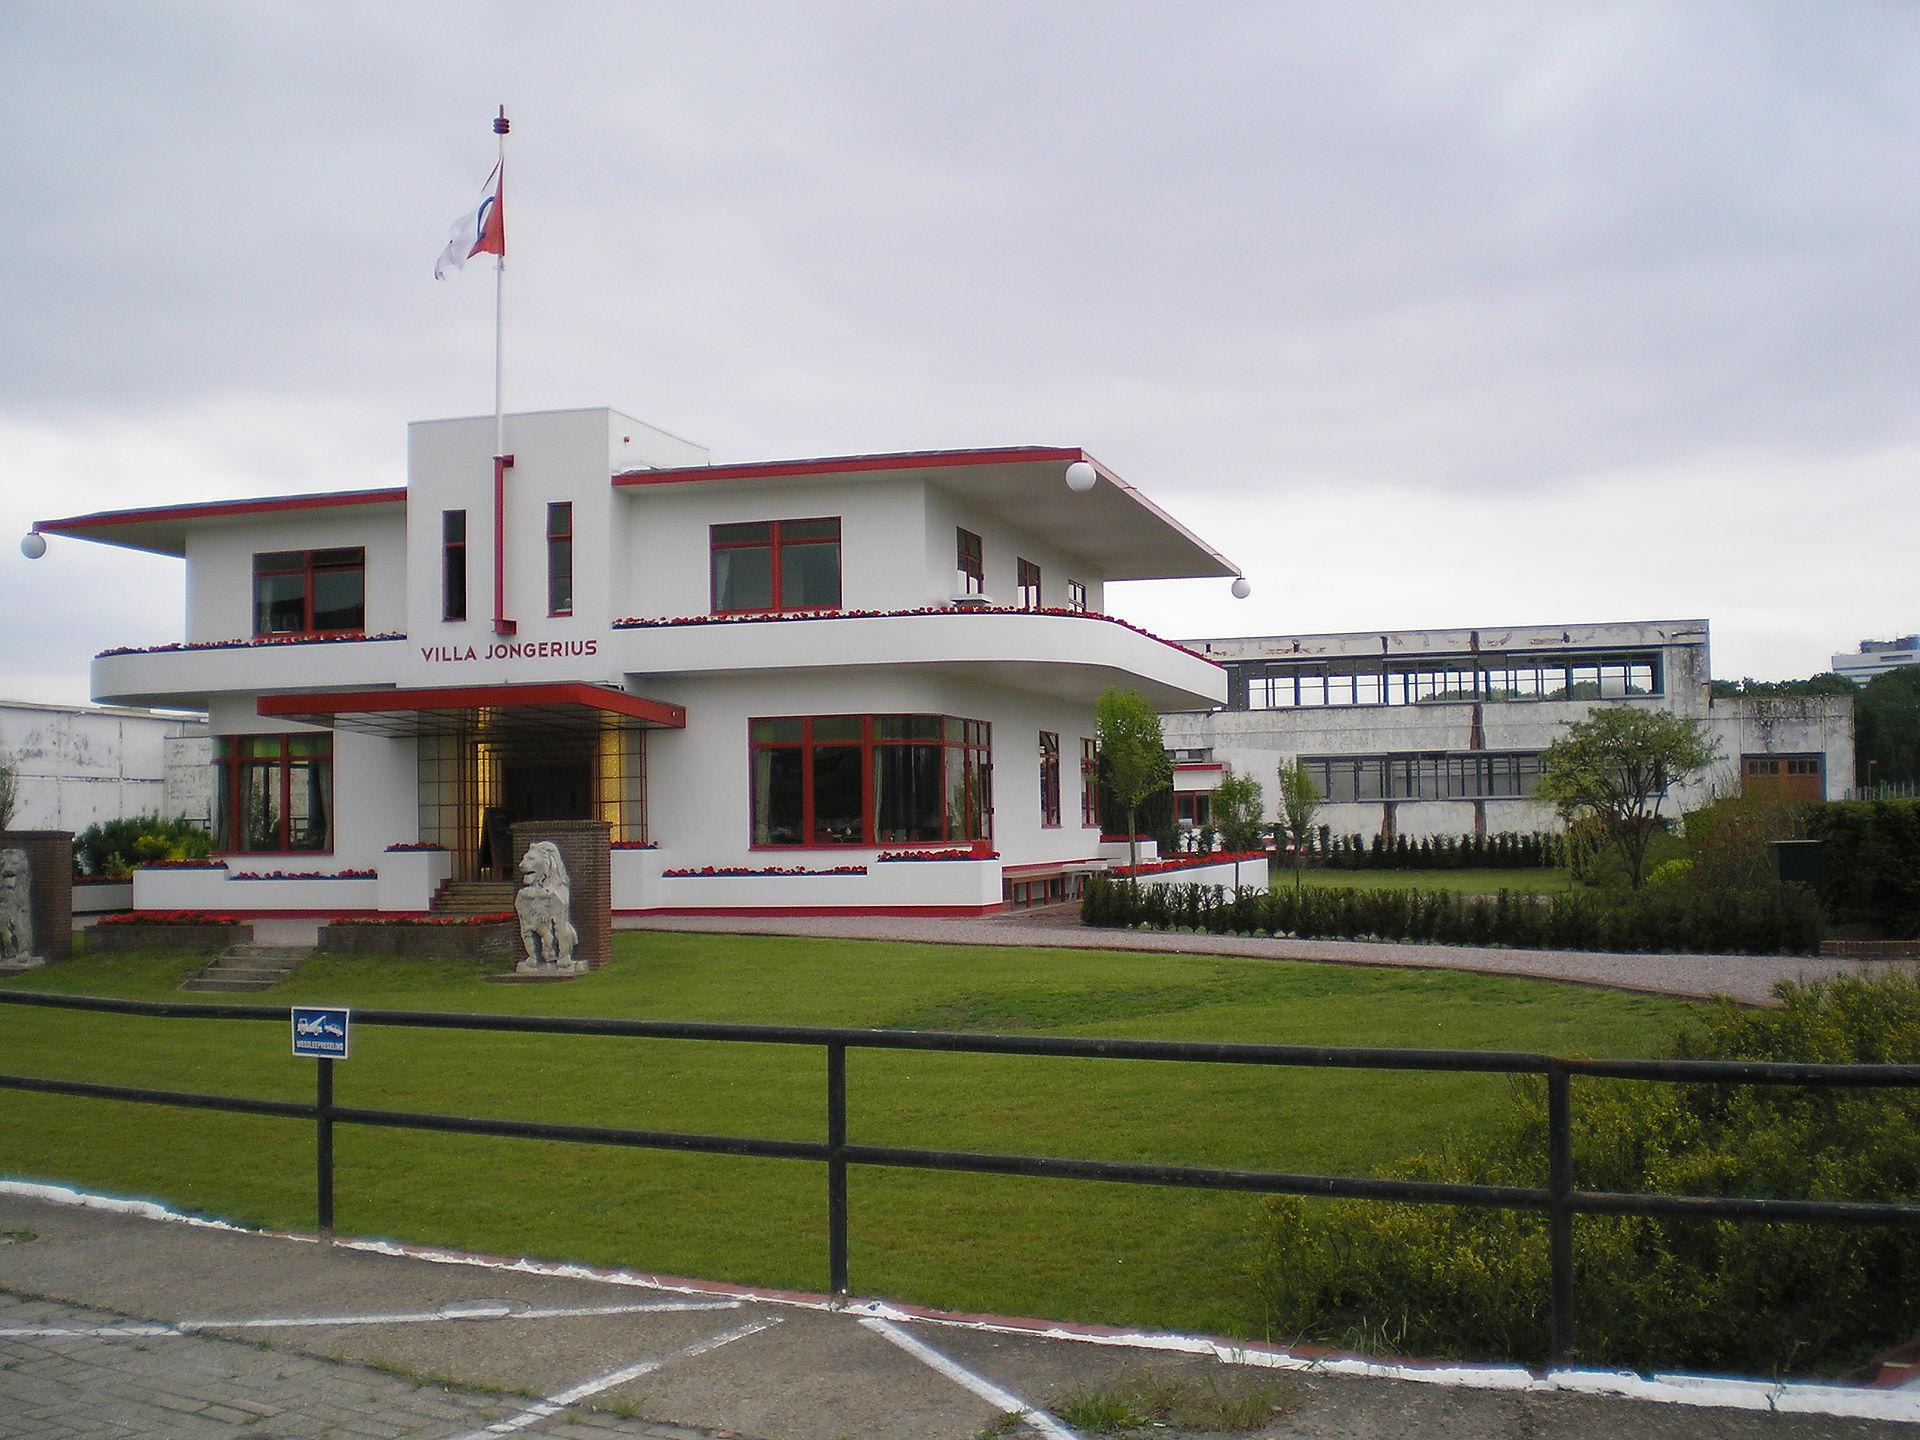 Villa jongerius wikipedia - Deco buitenkant huis ...